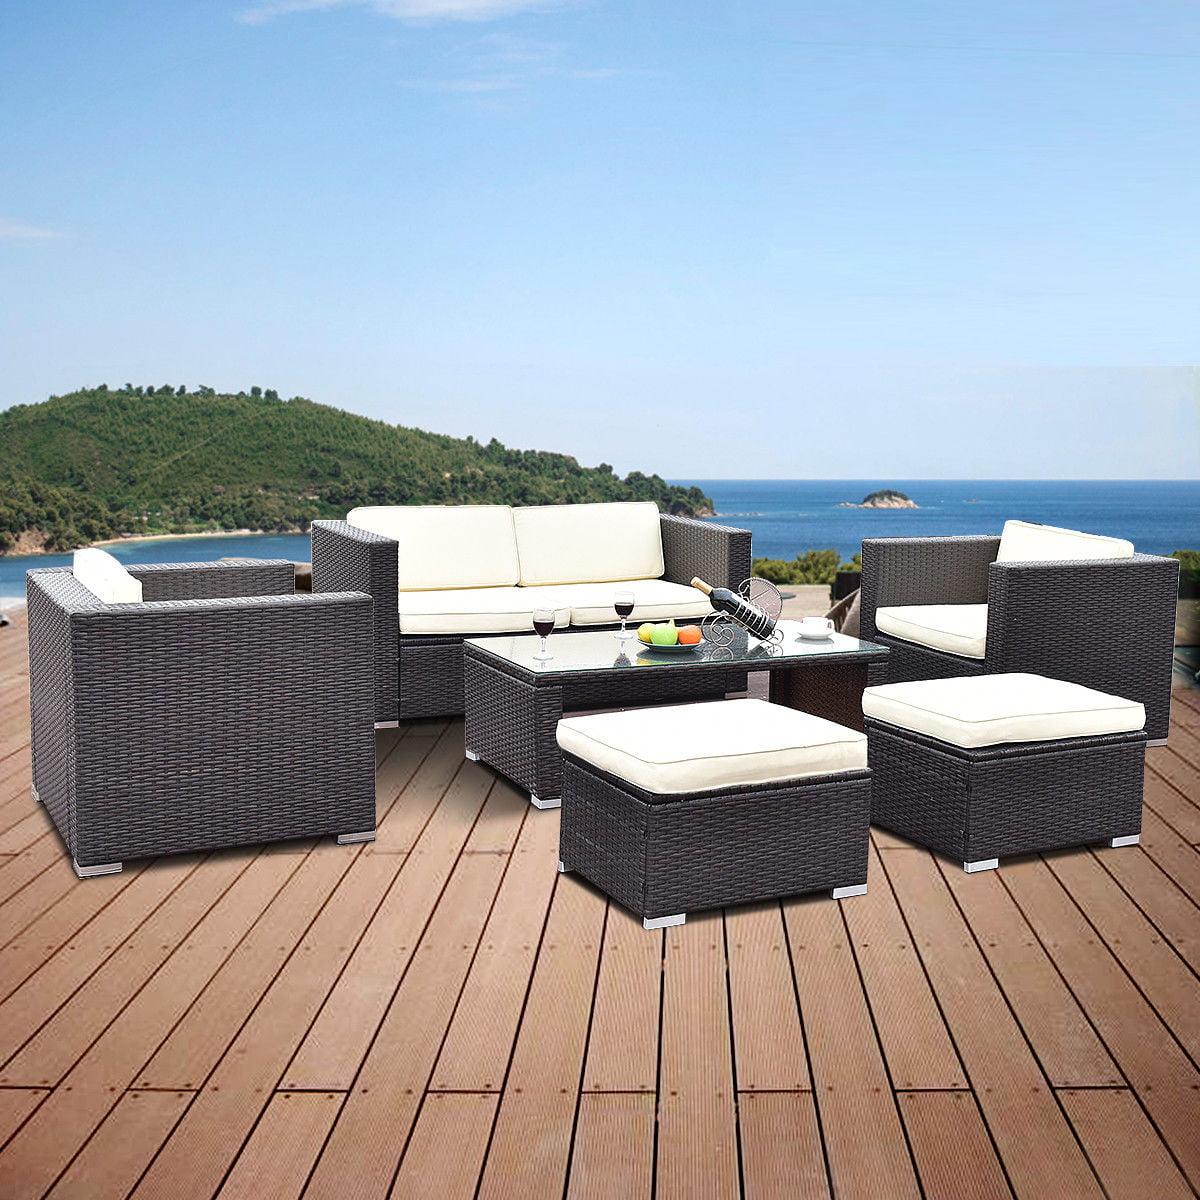 Costway 6 PCS Patio Rattan Wicker Furniture Set Loveseat Ottoman Cushioned Garden by Costway